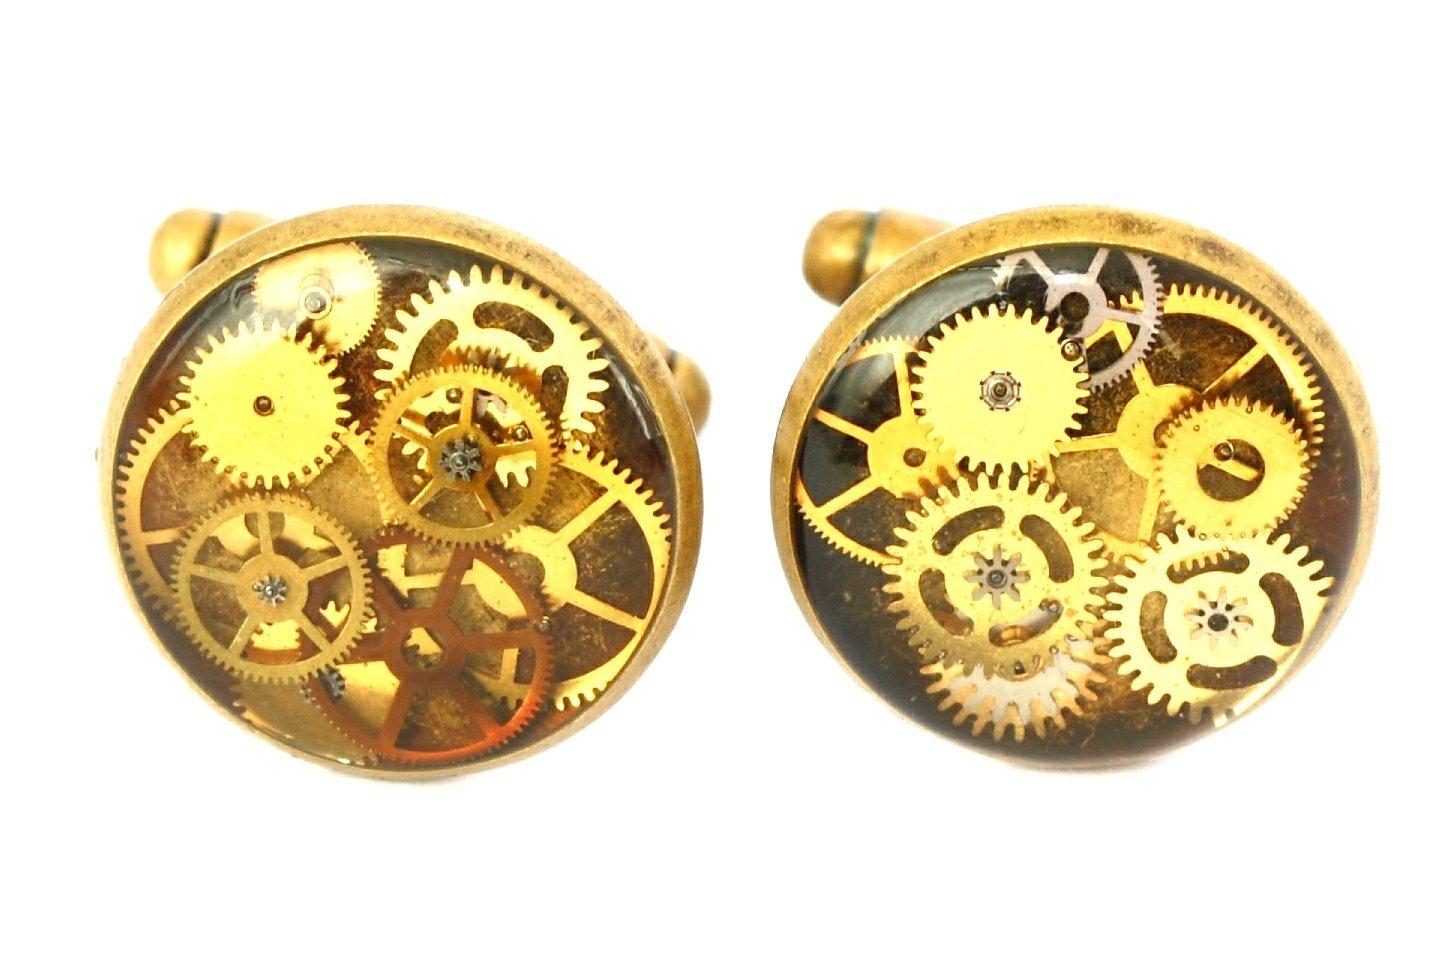 Cog wheel cufflinks, Steampunk Cufflinks, cuff links, brass cufflinks, watchpart cufflinks, gifts for him, mens gifts,